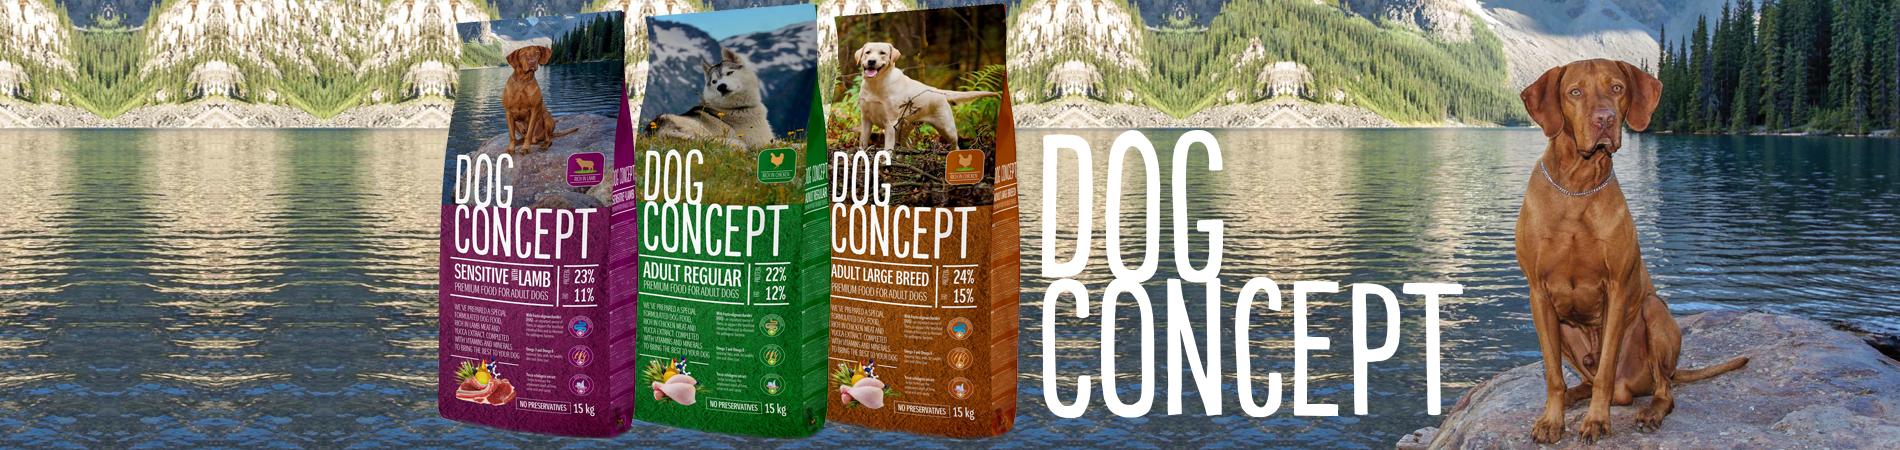 dog-concept-site